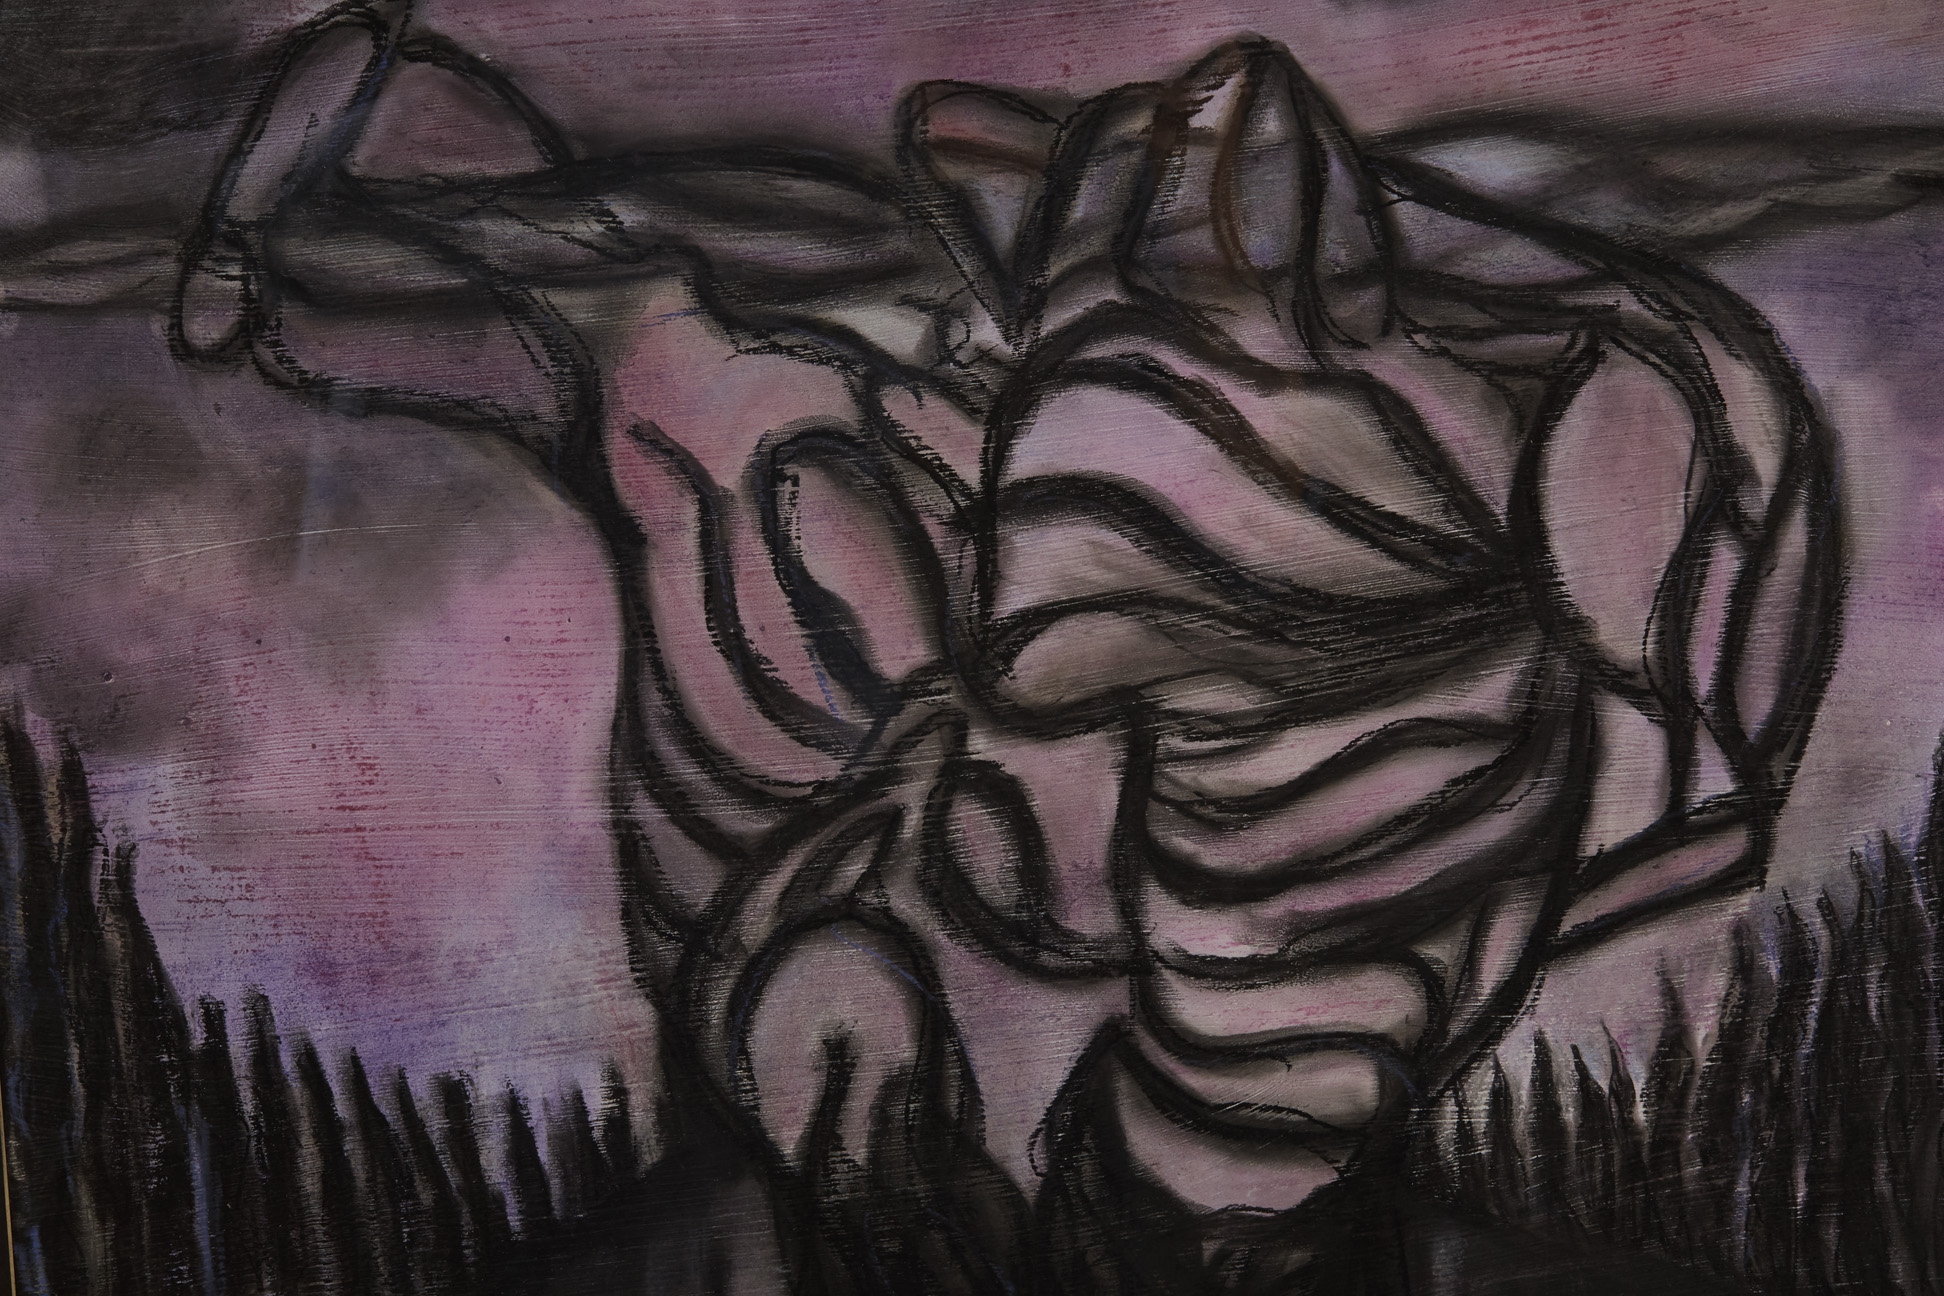 UNATTRIBUTED (20TH/21ST CENTURY) - SURREALIST TORSO - Image 3 of 3